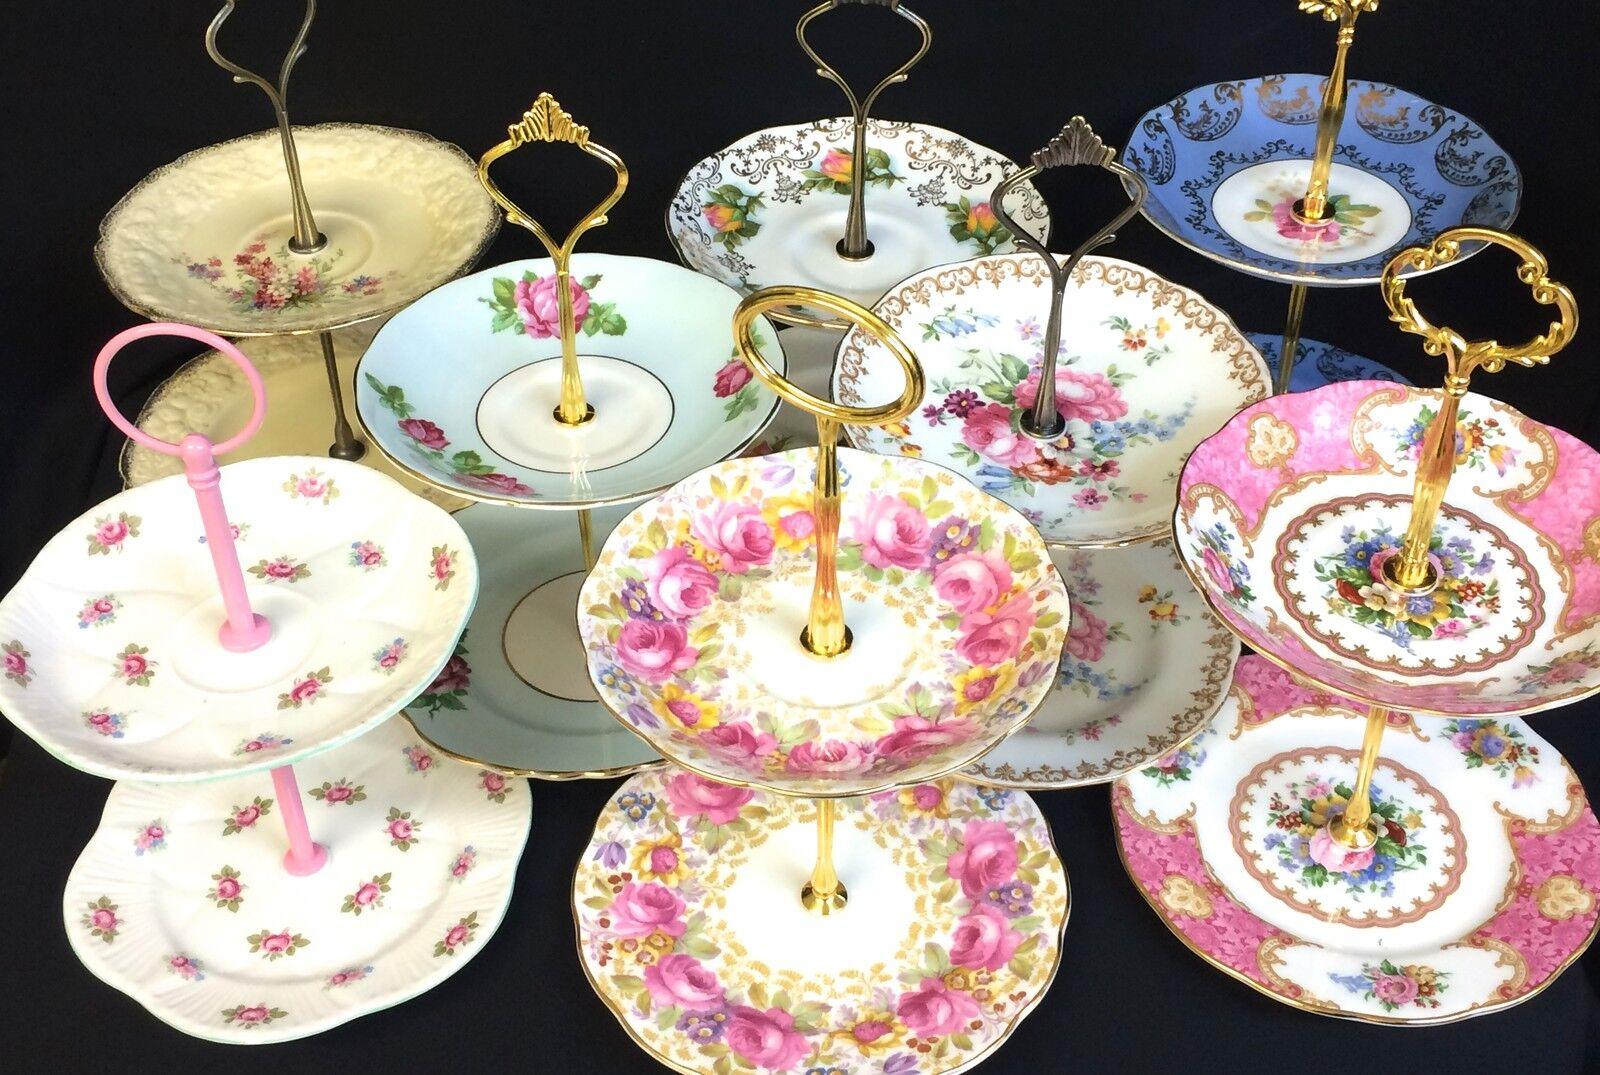 2 Tier Vintage Plate Cake Jewellery Stands High Tea Colclough Royal Vale Albert & Wedding Cake Stands \u0026 Plates  Wedding Supplies  Home \u0026 Garden